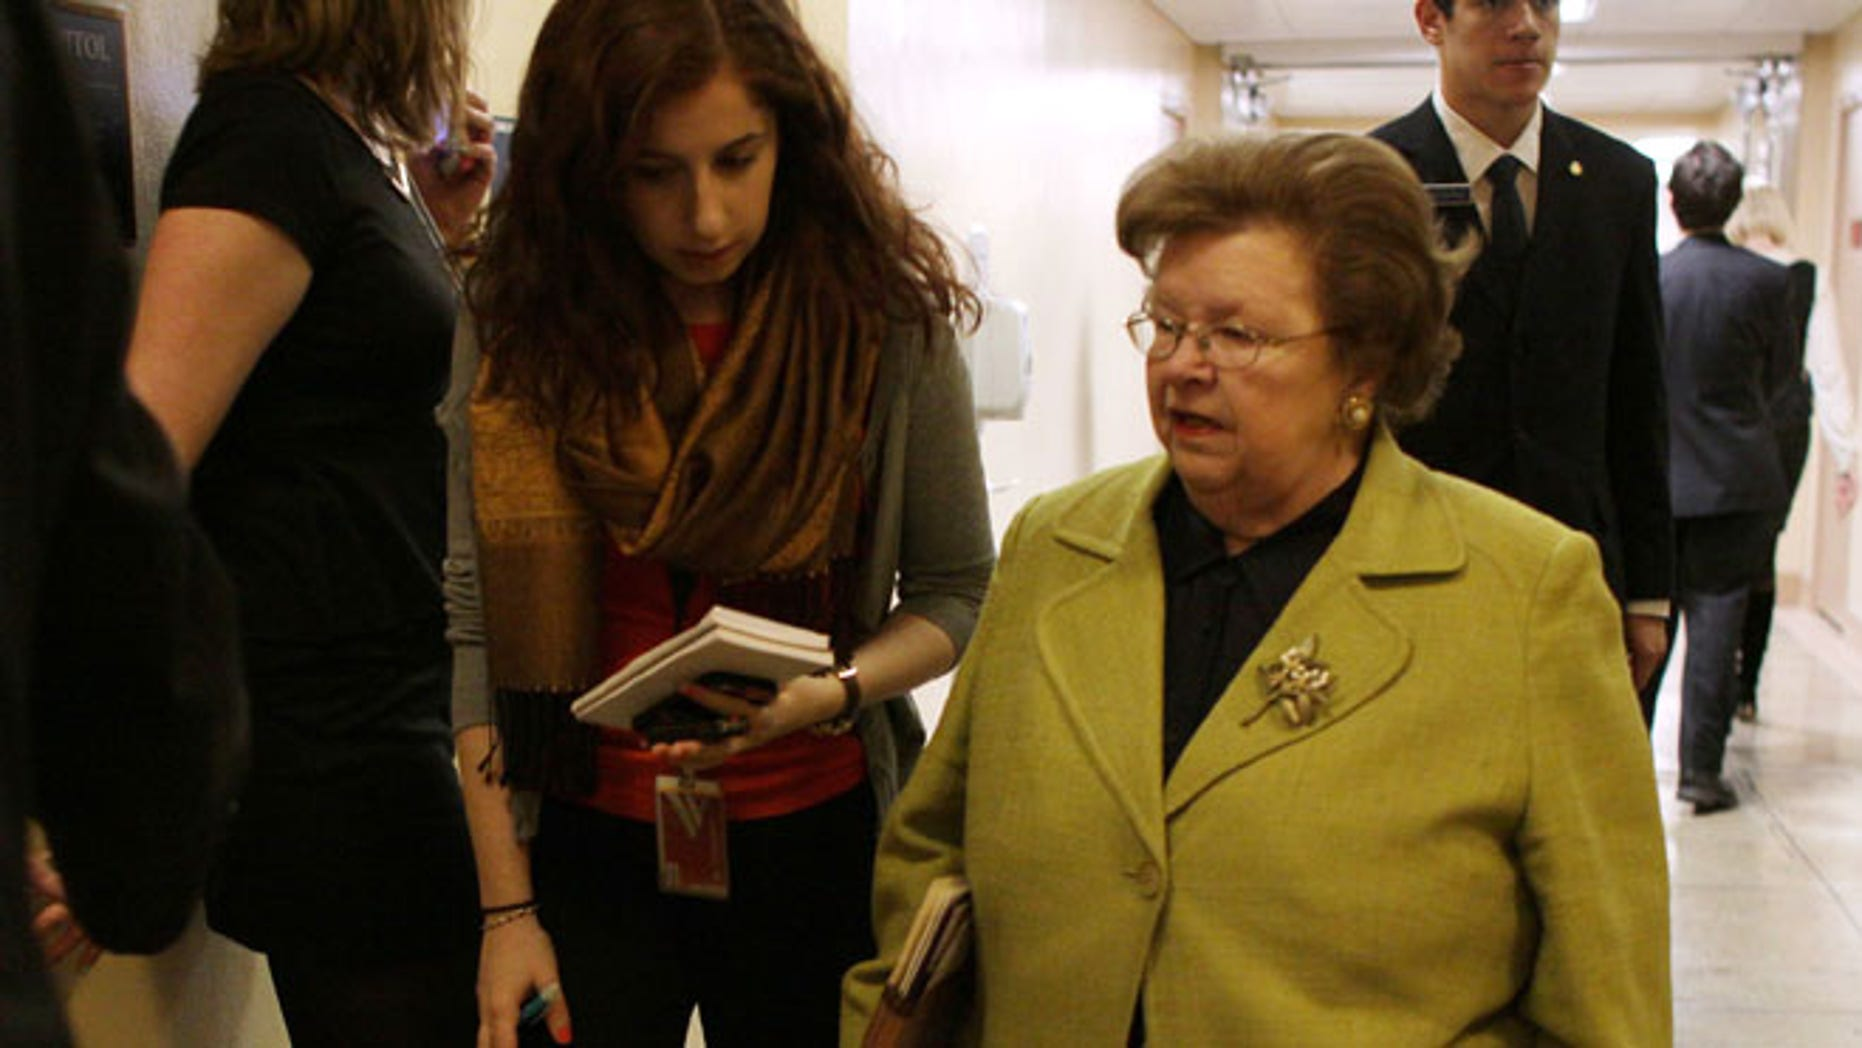 FILE: February 25, 2015: Sen. Barbara Mikulski, D-Md., talks with a reporter on Capitol Hill, Washington, D.C.